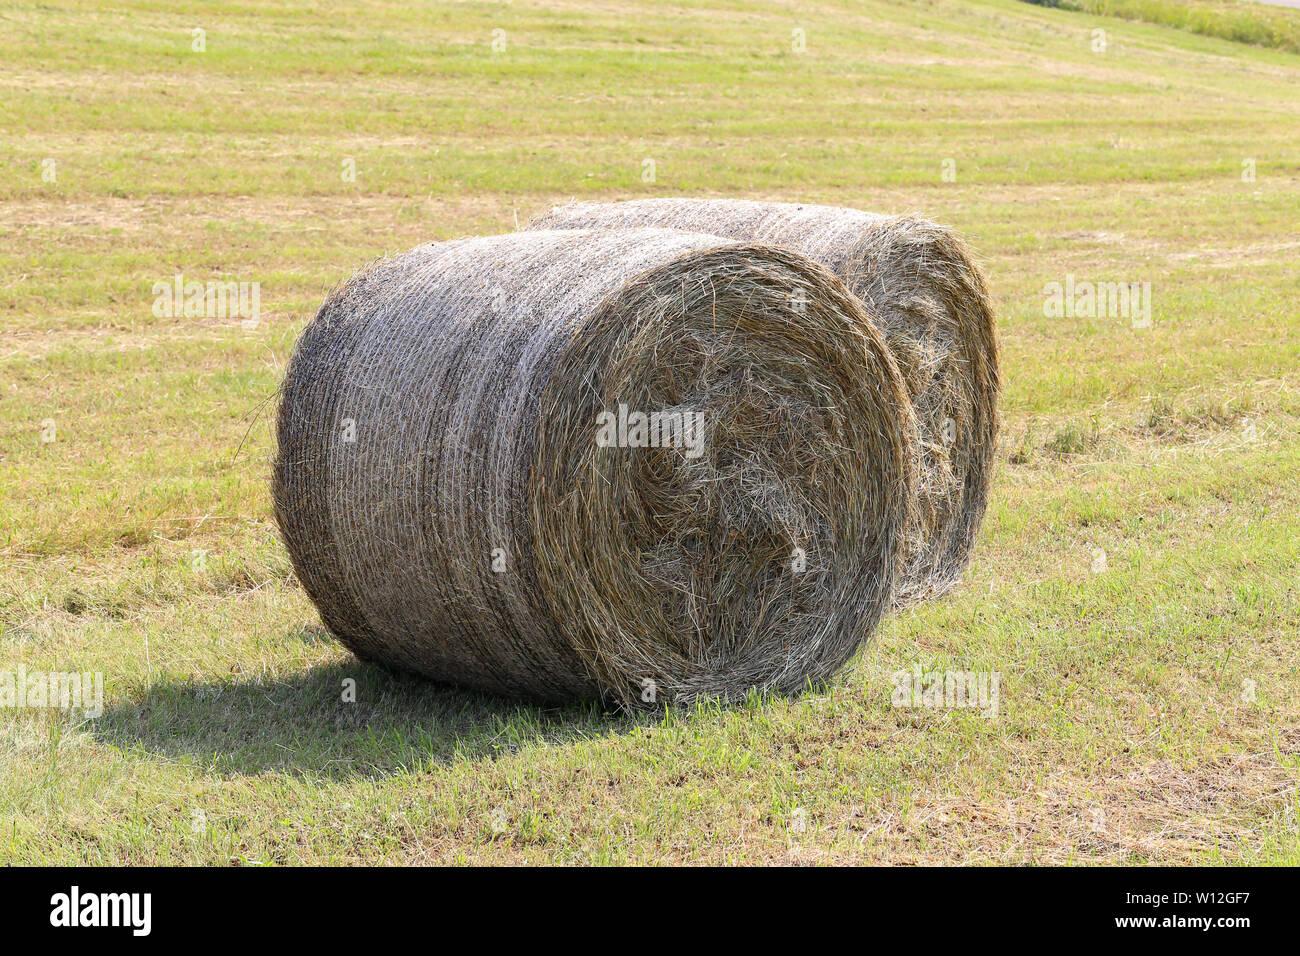 New Land Rolls Stock Photos & New Land Rolls Stock Images - Alamy